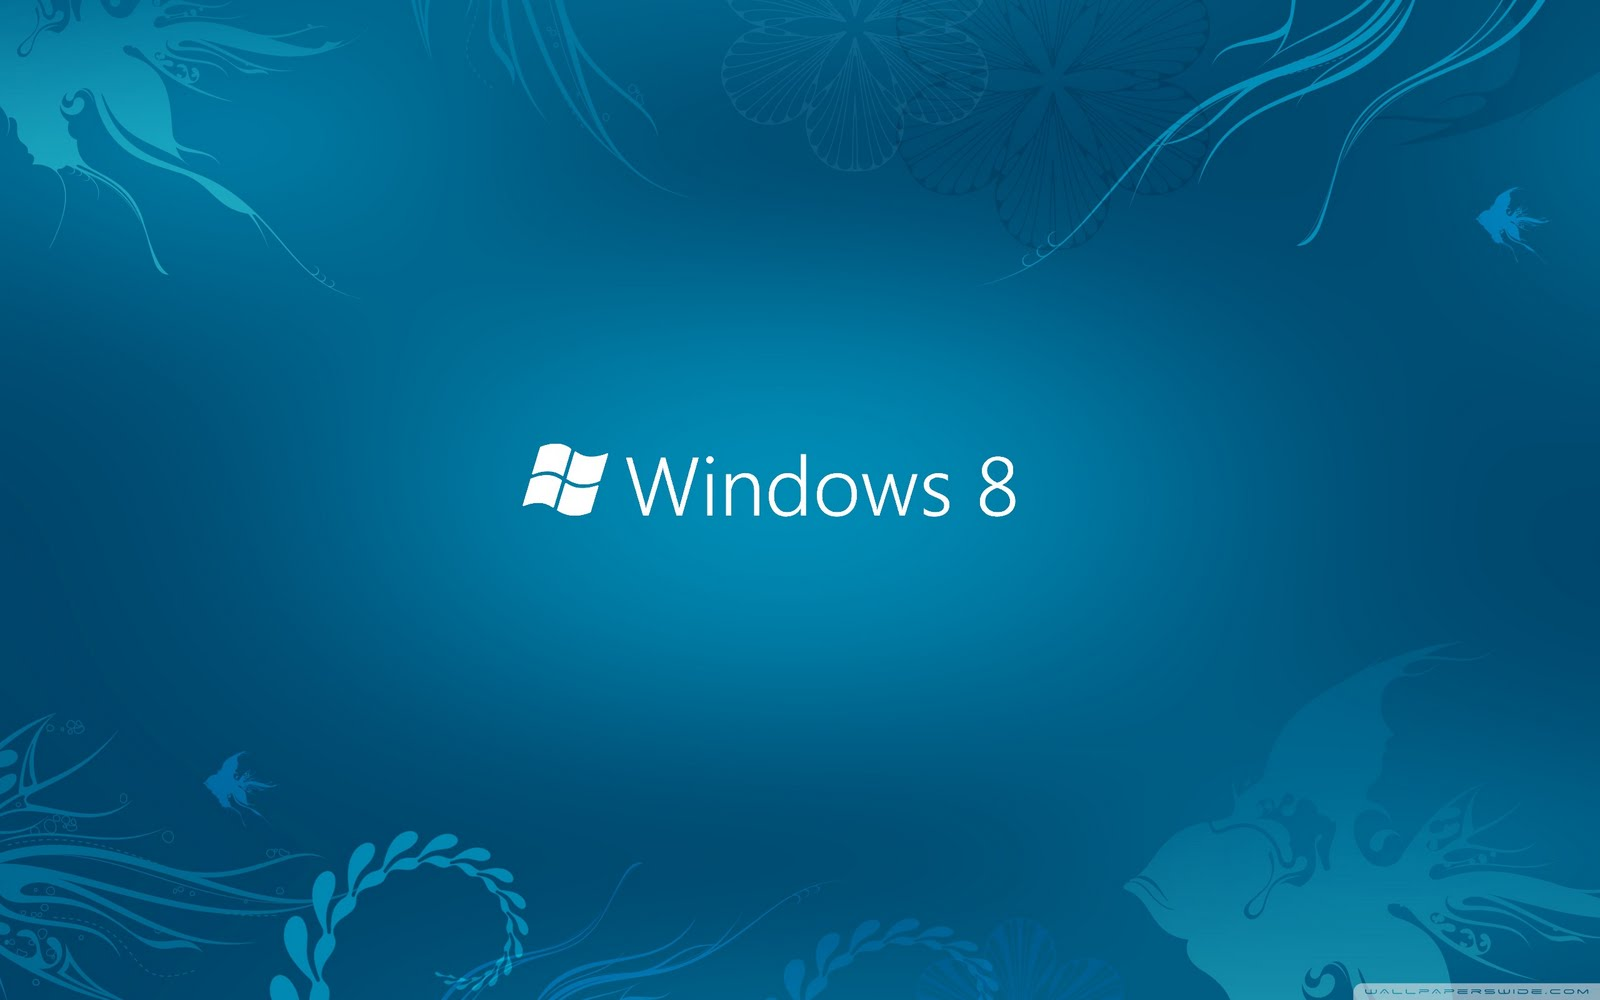 Top-12-Cool-Windows-8-HD-wallpapers-for-desktop-backgrounds-81.jpg